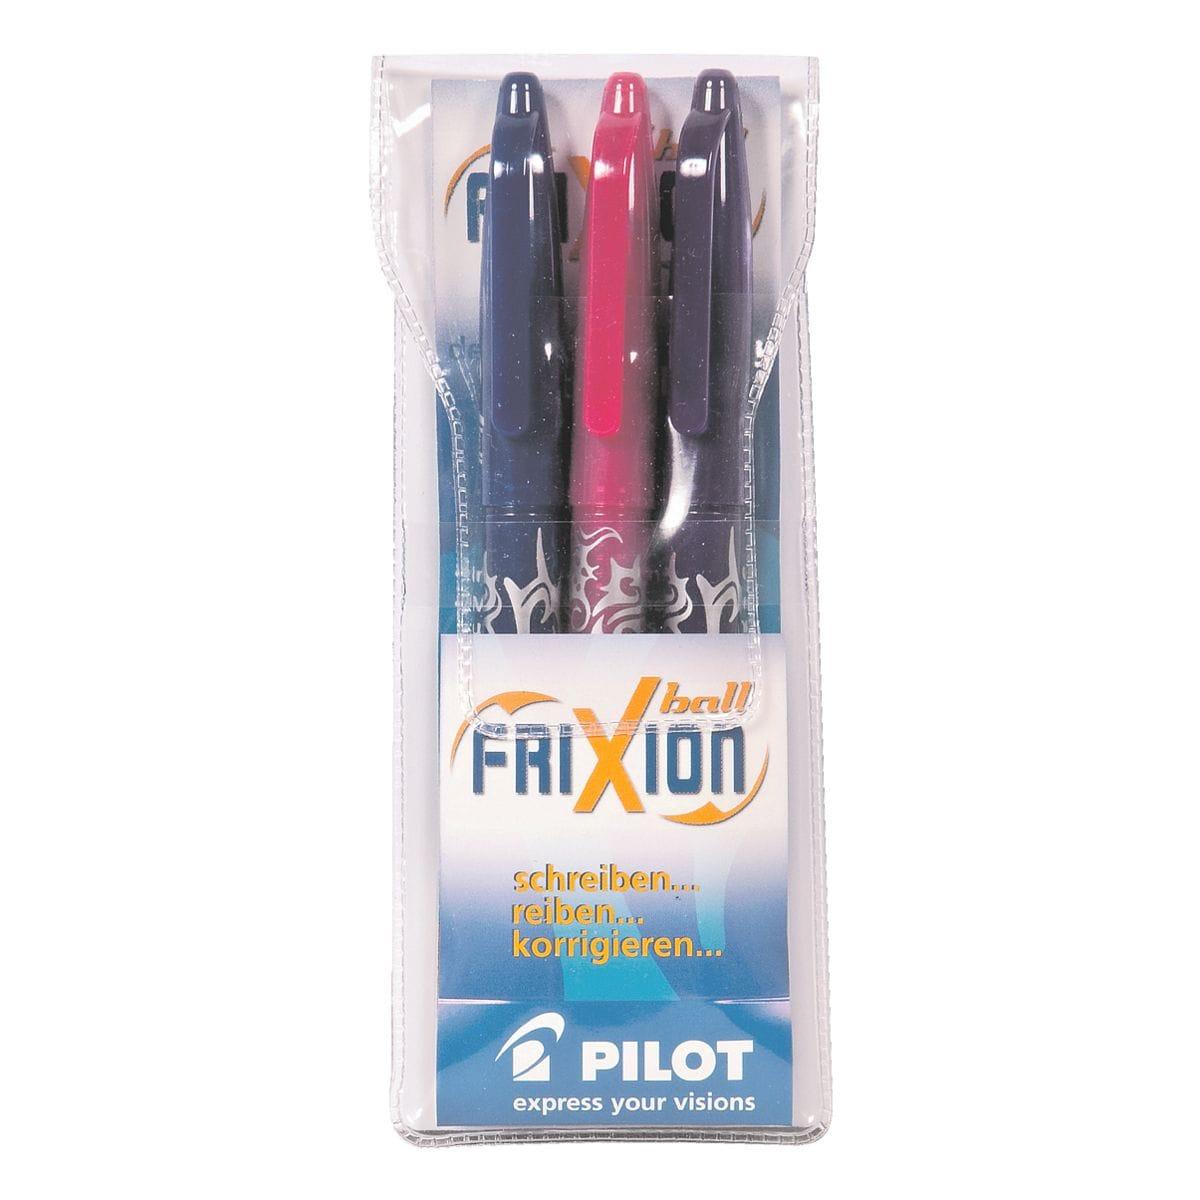 3x Tintenroller Pilot FriXion Ball 0.7, radierbar